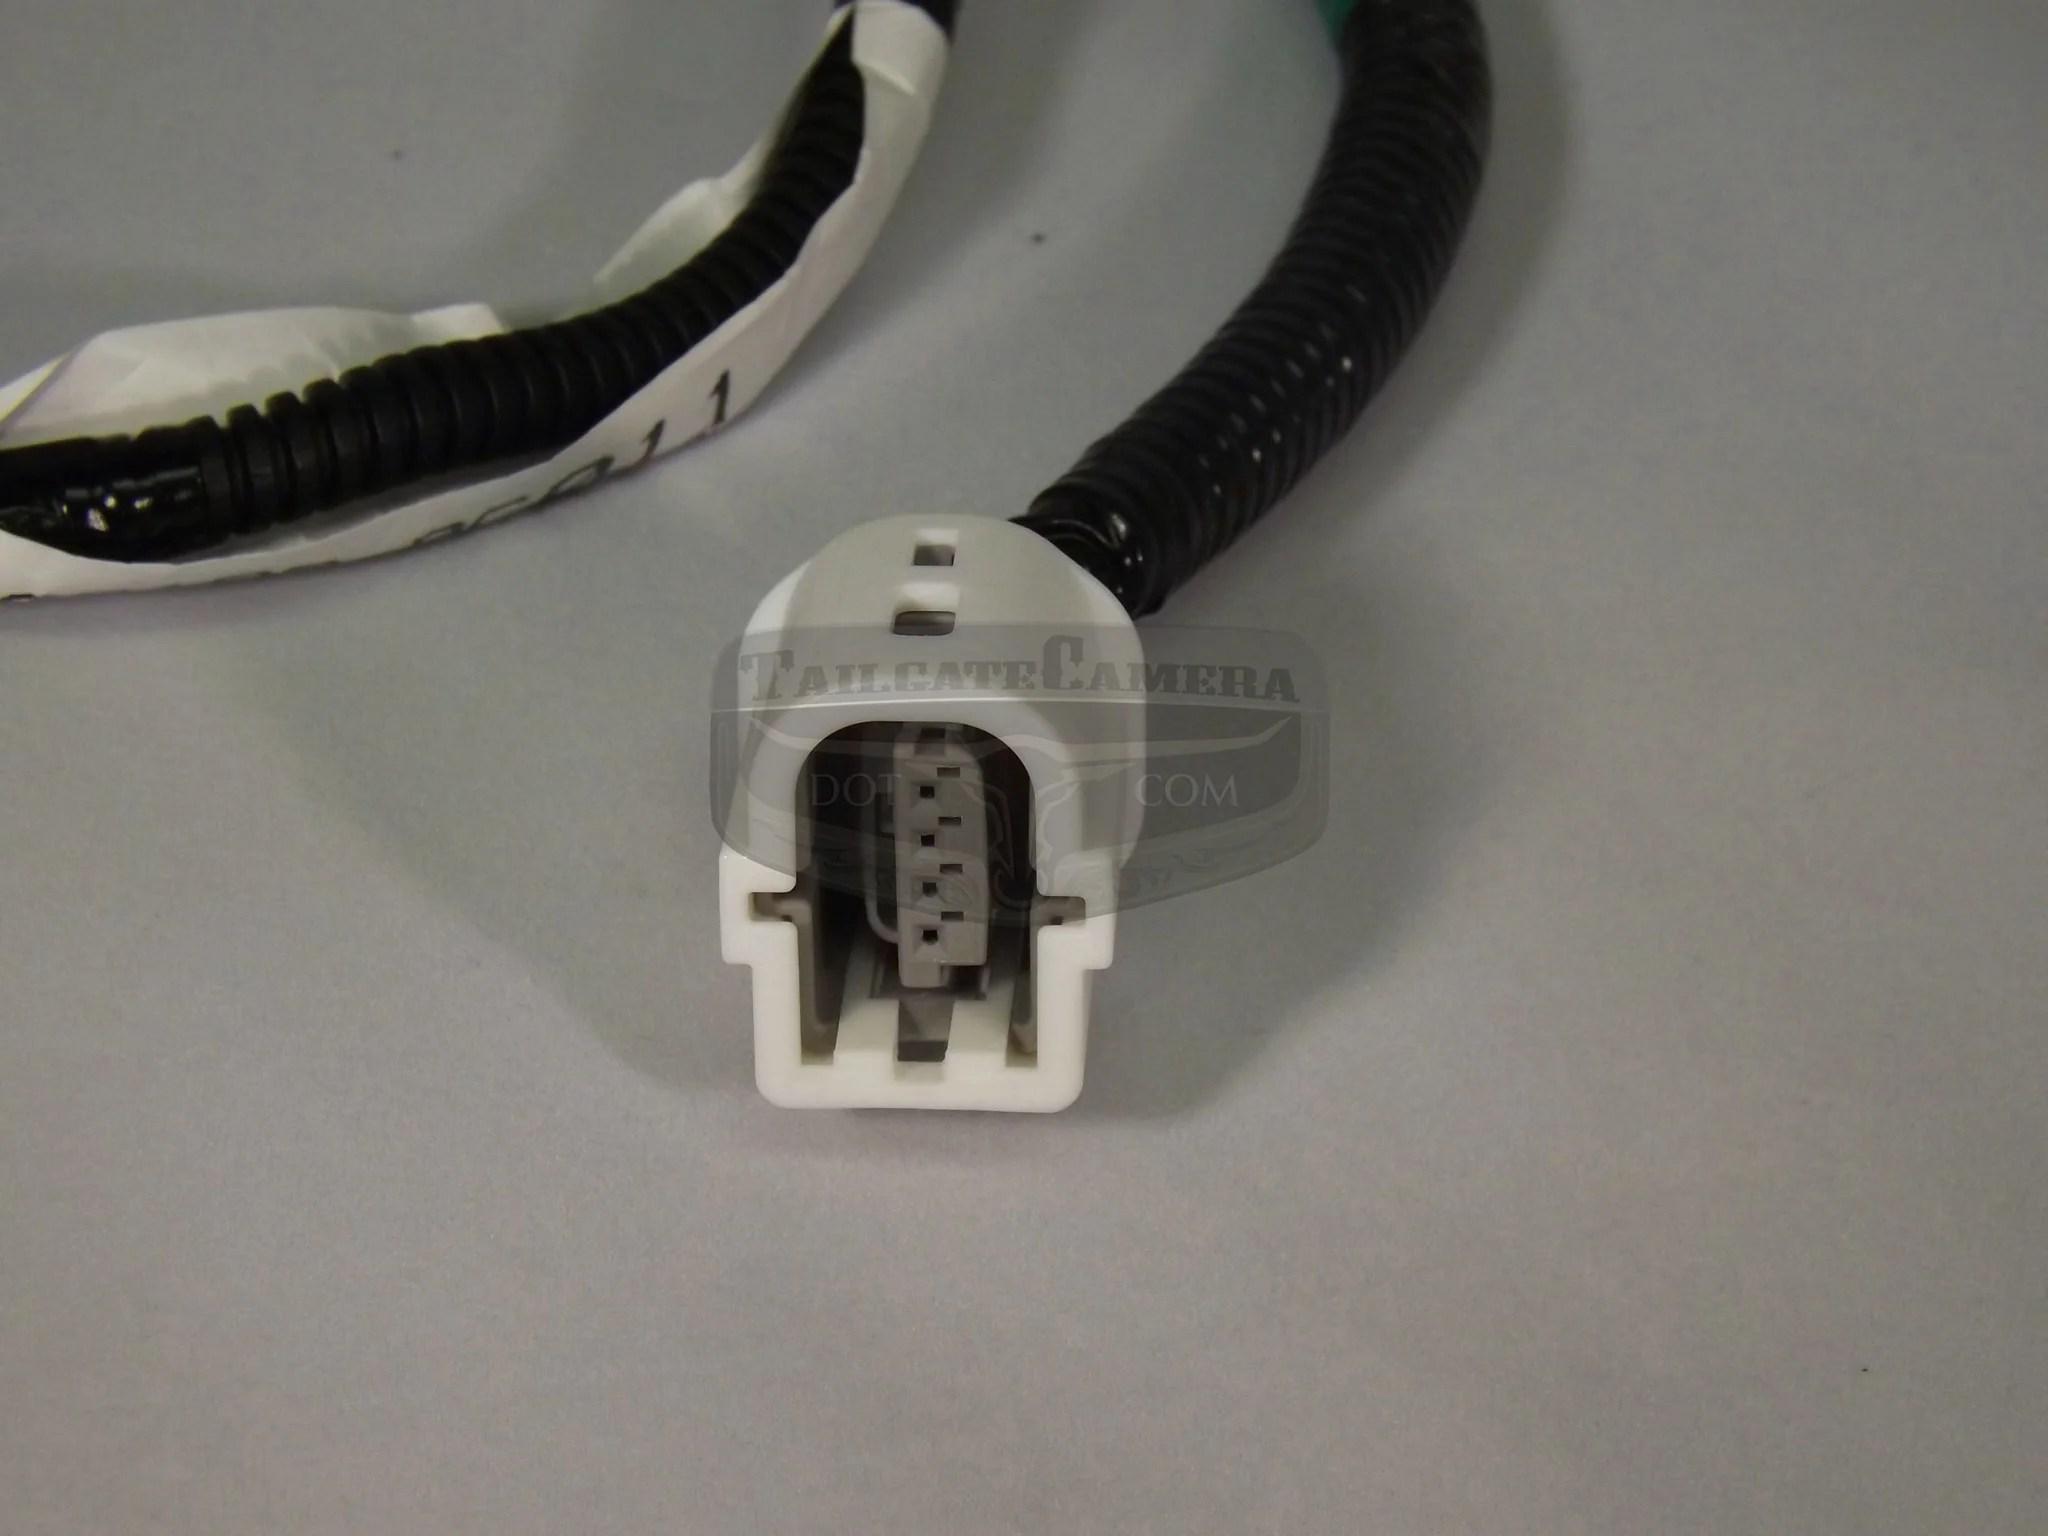 2008 Toyota Tundra Backup Camera Wiring On Wiring Reverse Camera